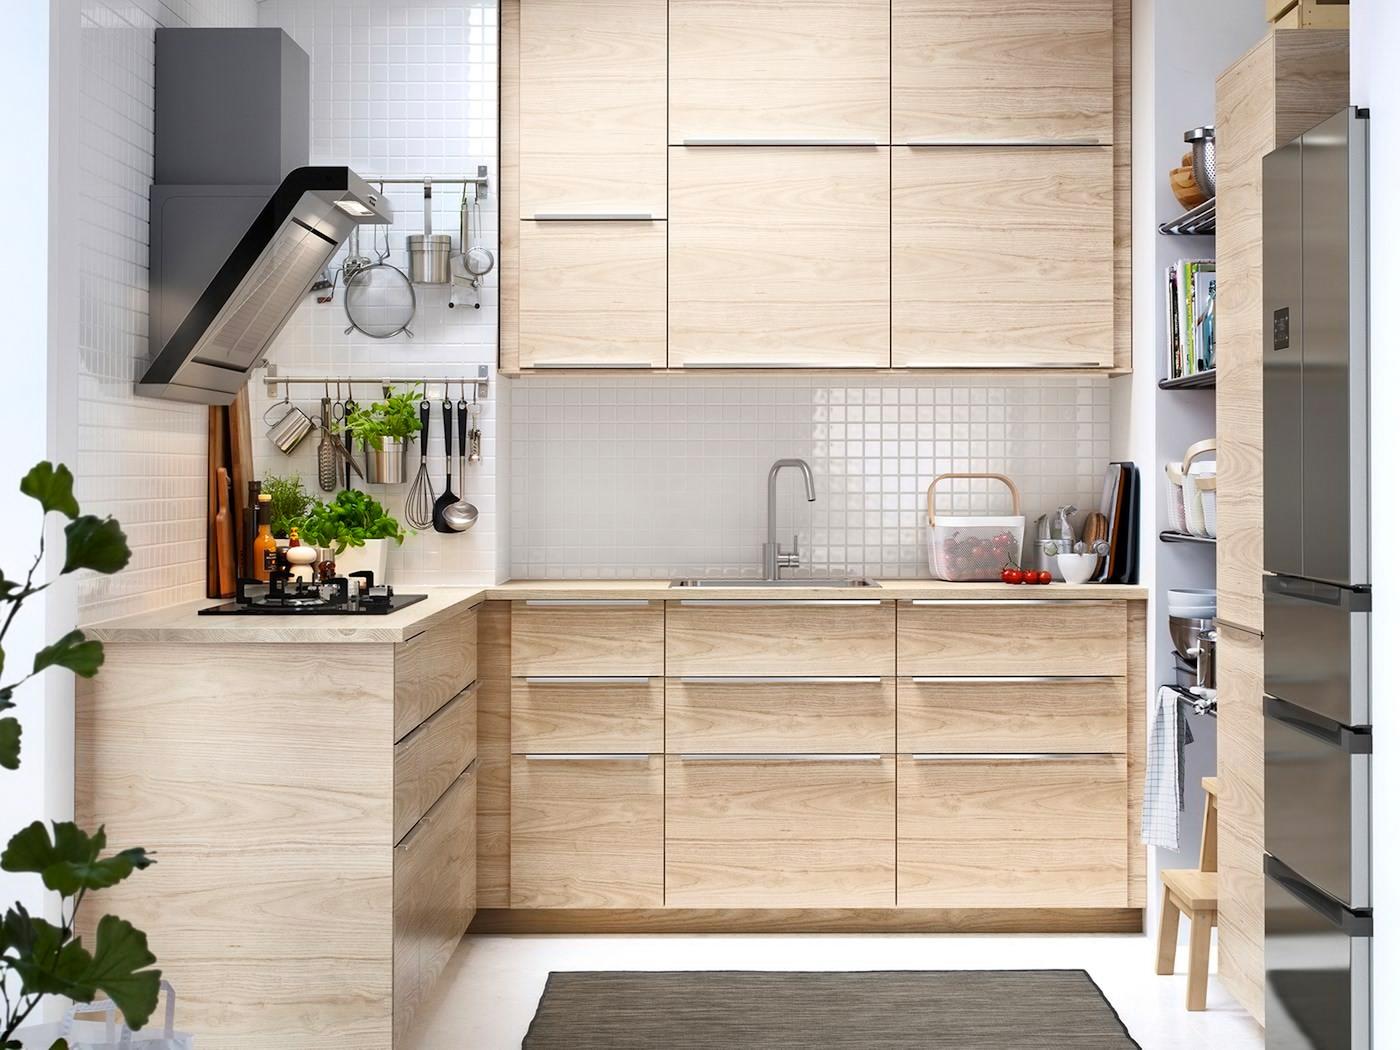 ikea kitchen planner tool mac